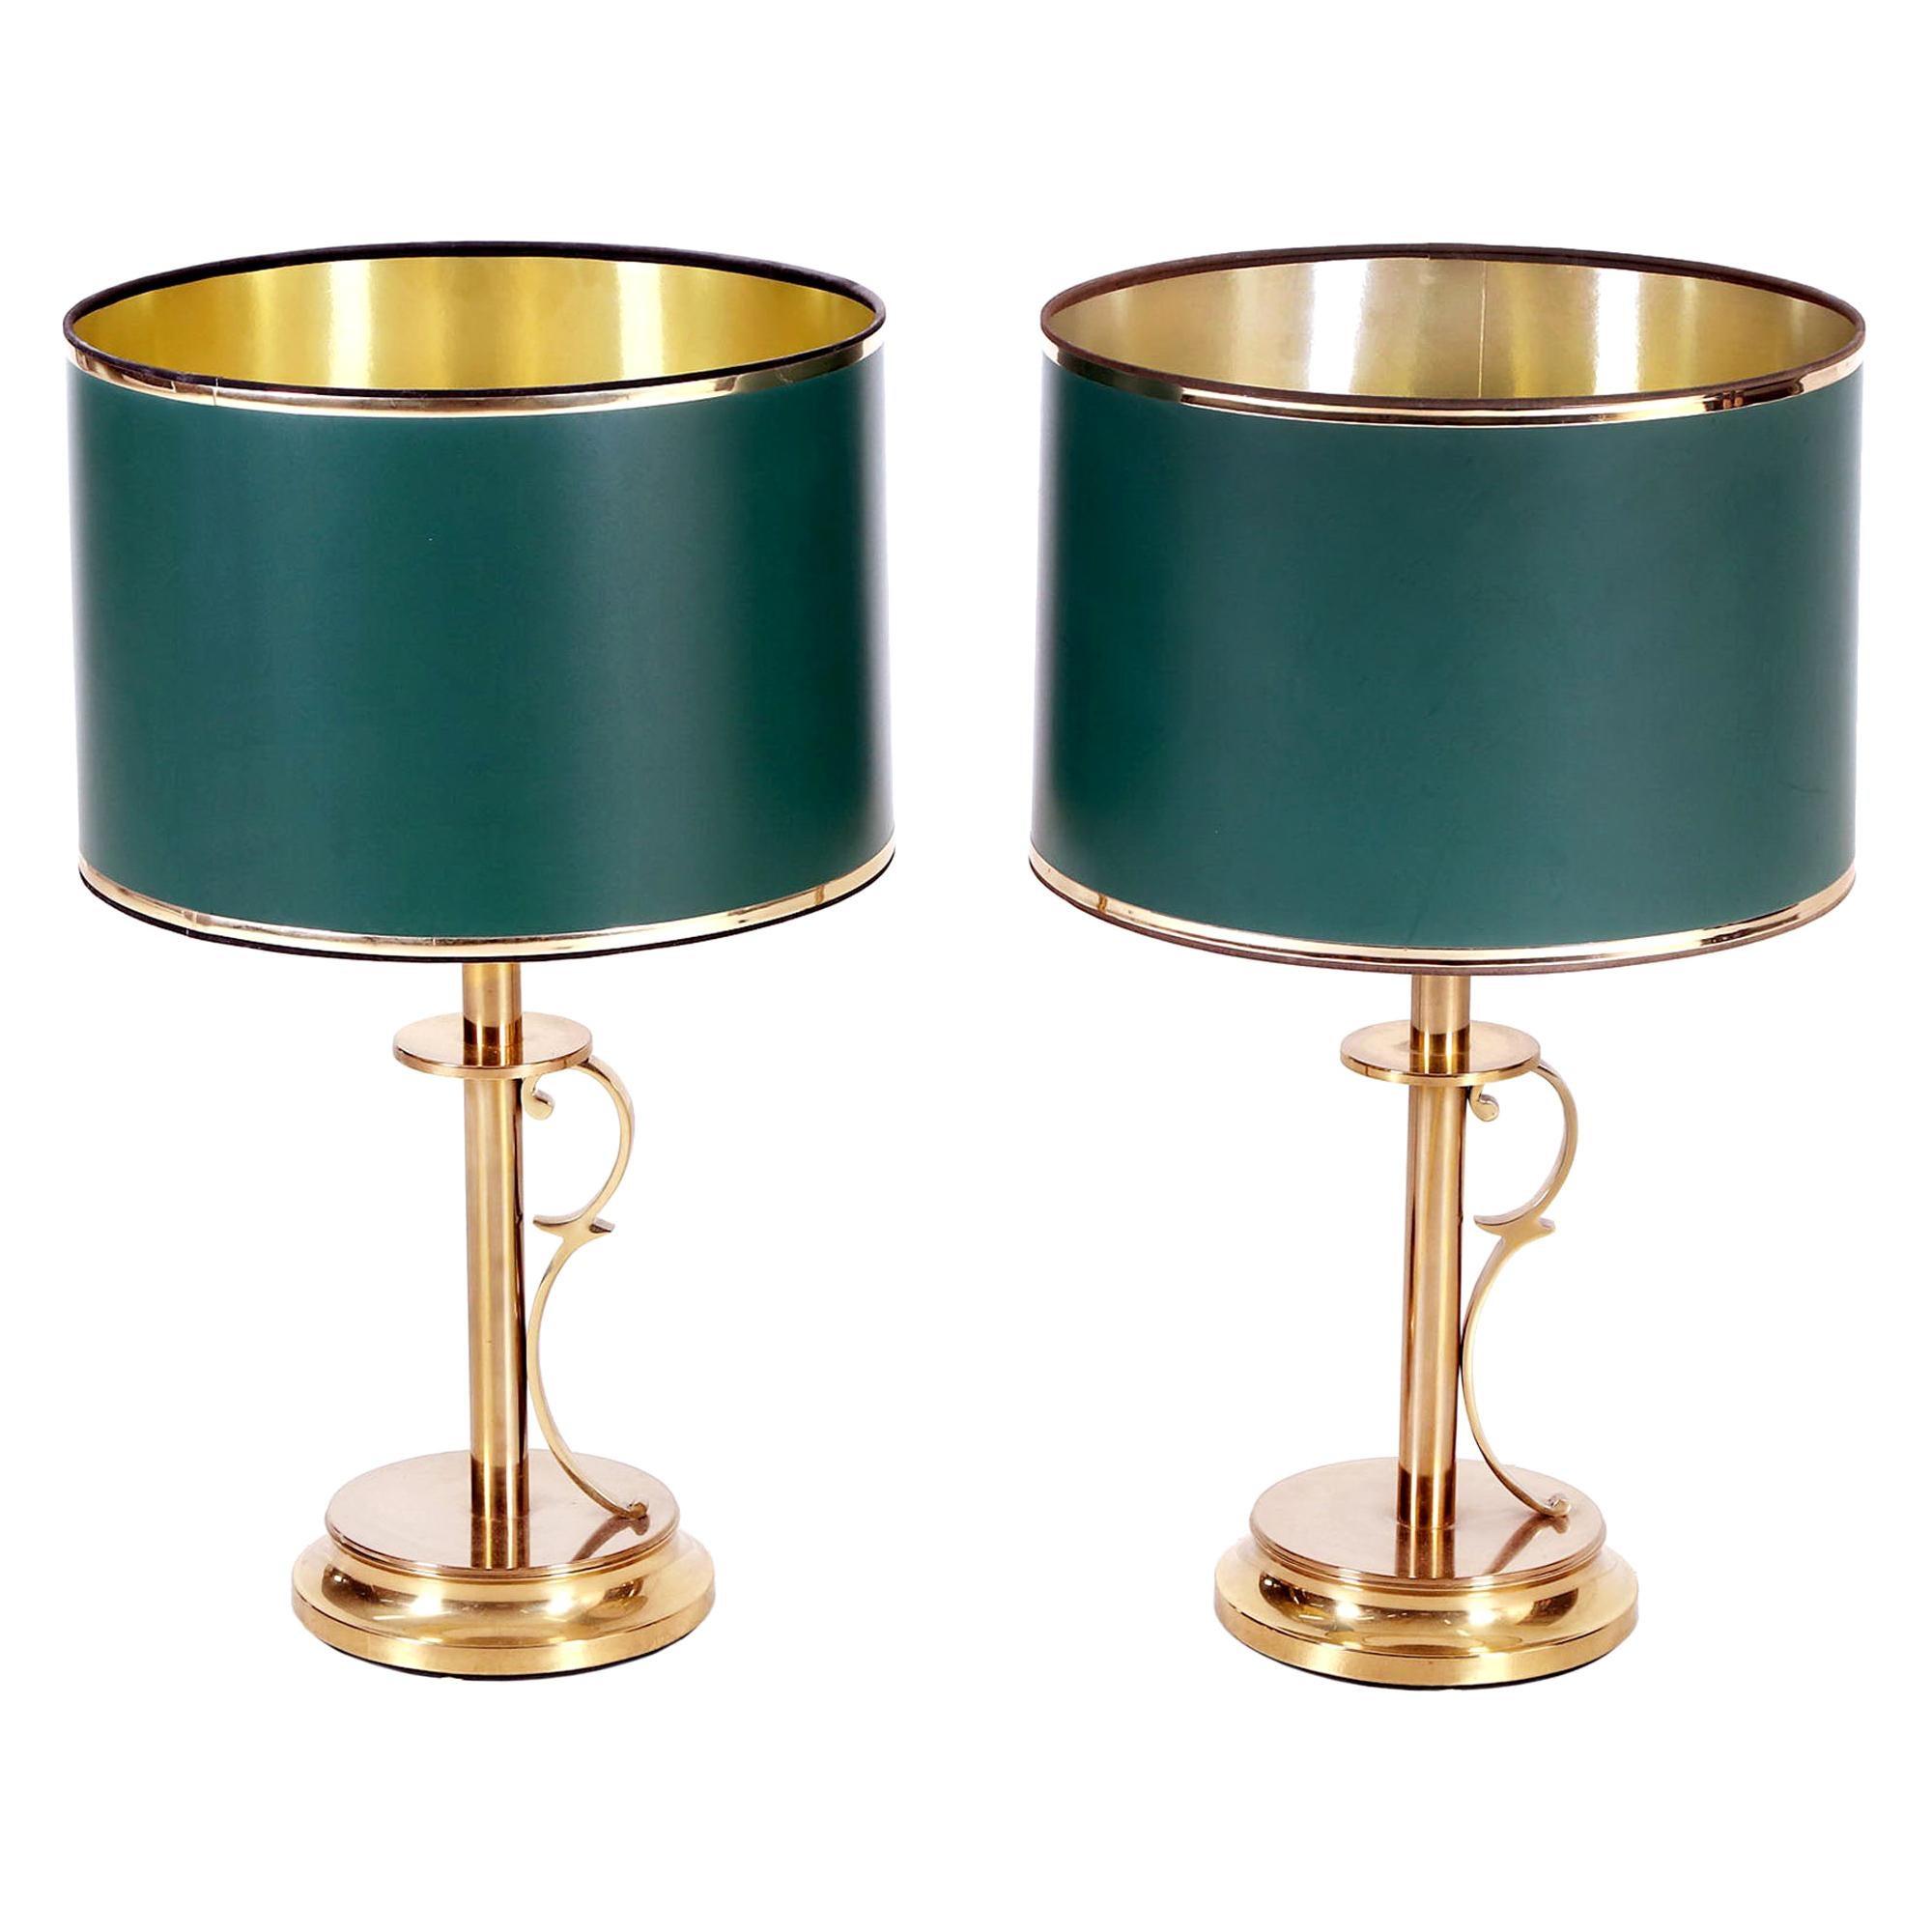 Mid-Century Modern Scandinavian Pair of Brass Table Lamps by Tranas Stilarmatur